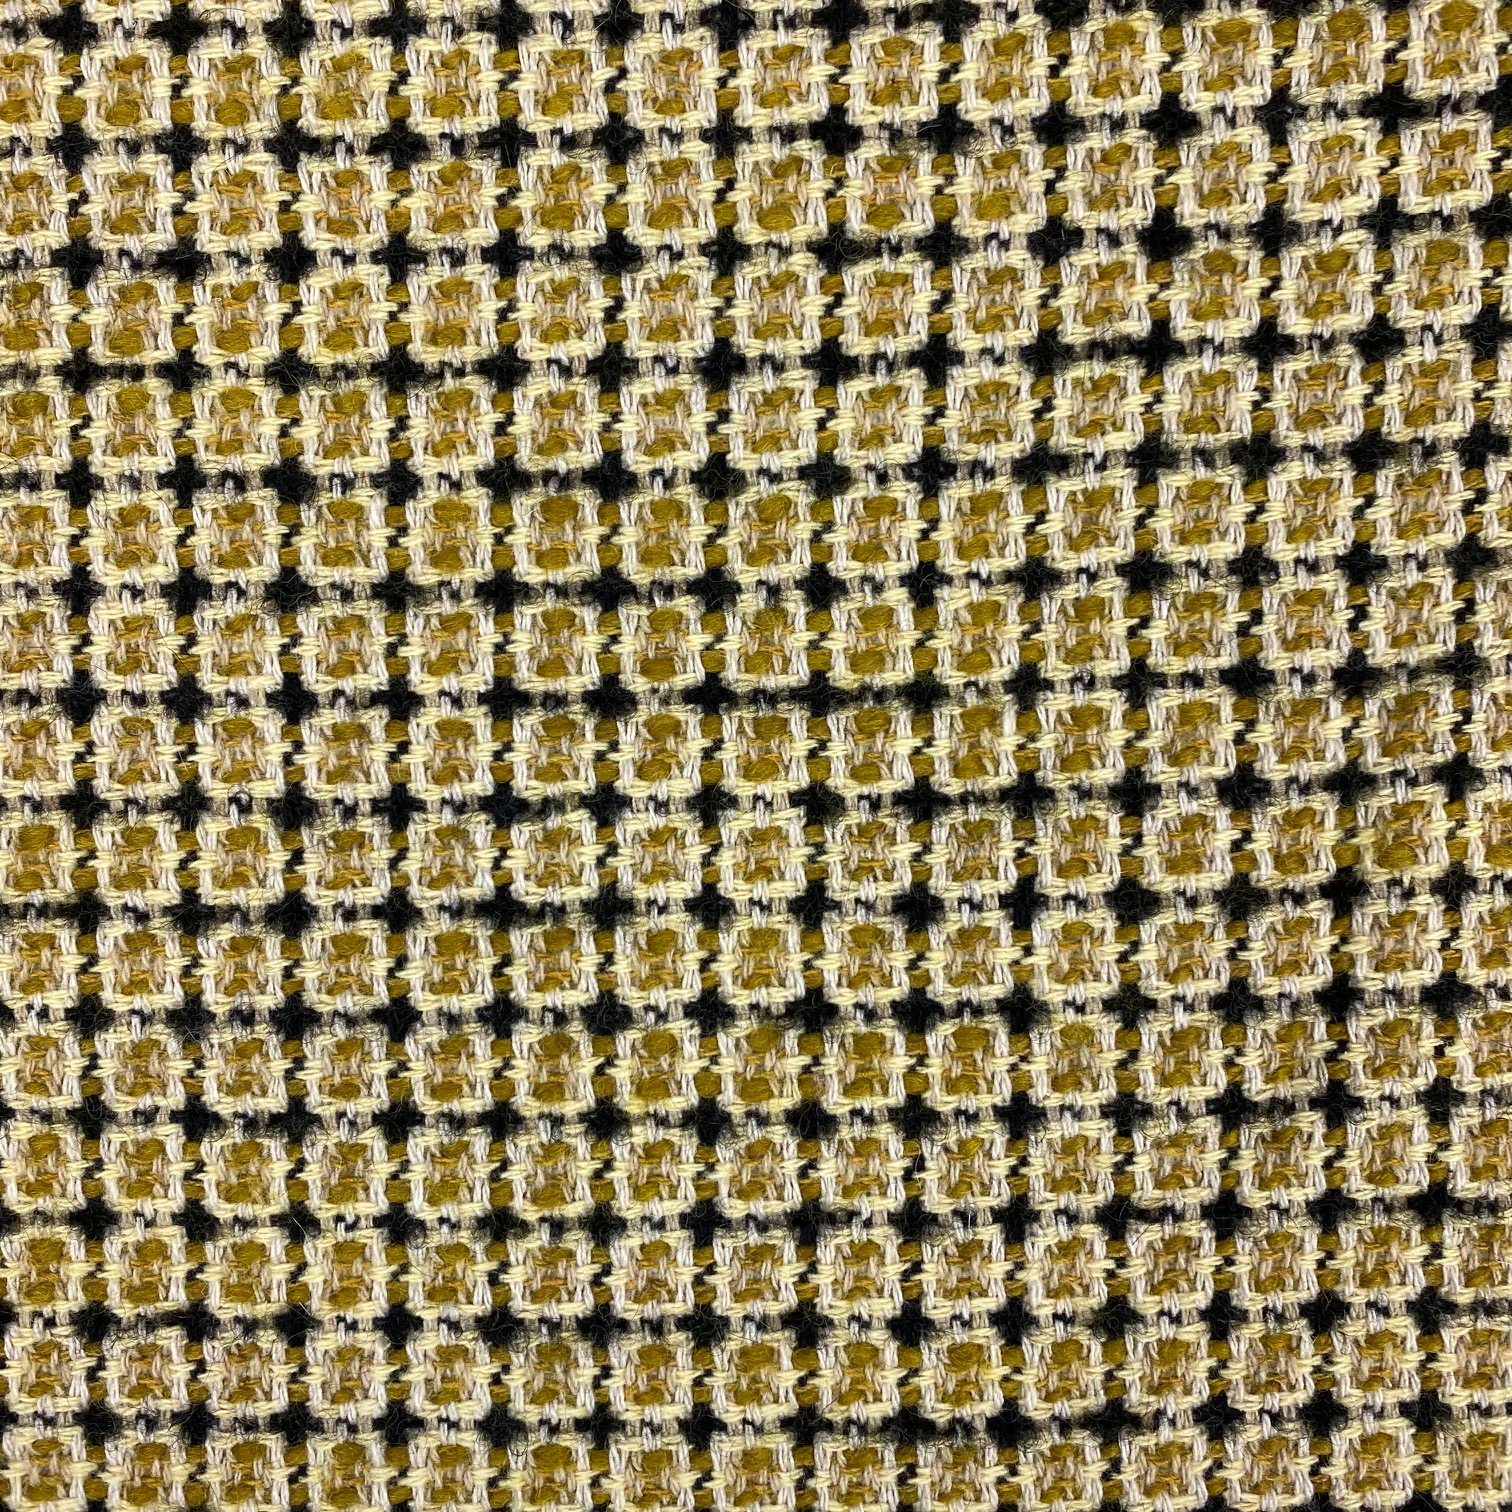 Mantelstoff, Buntgewebe Wolle, senf. Art. 3332-02